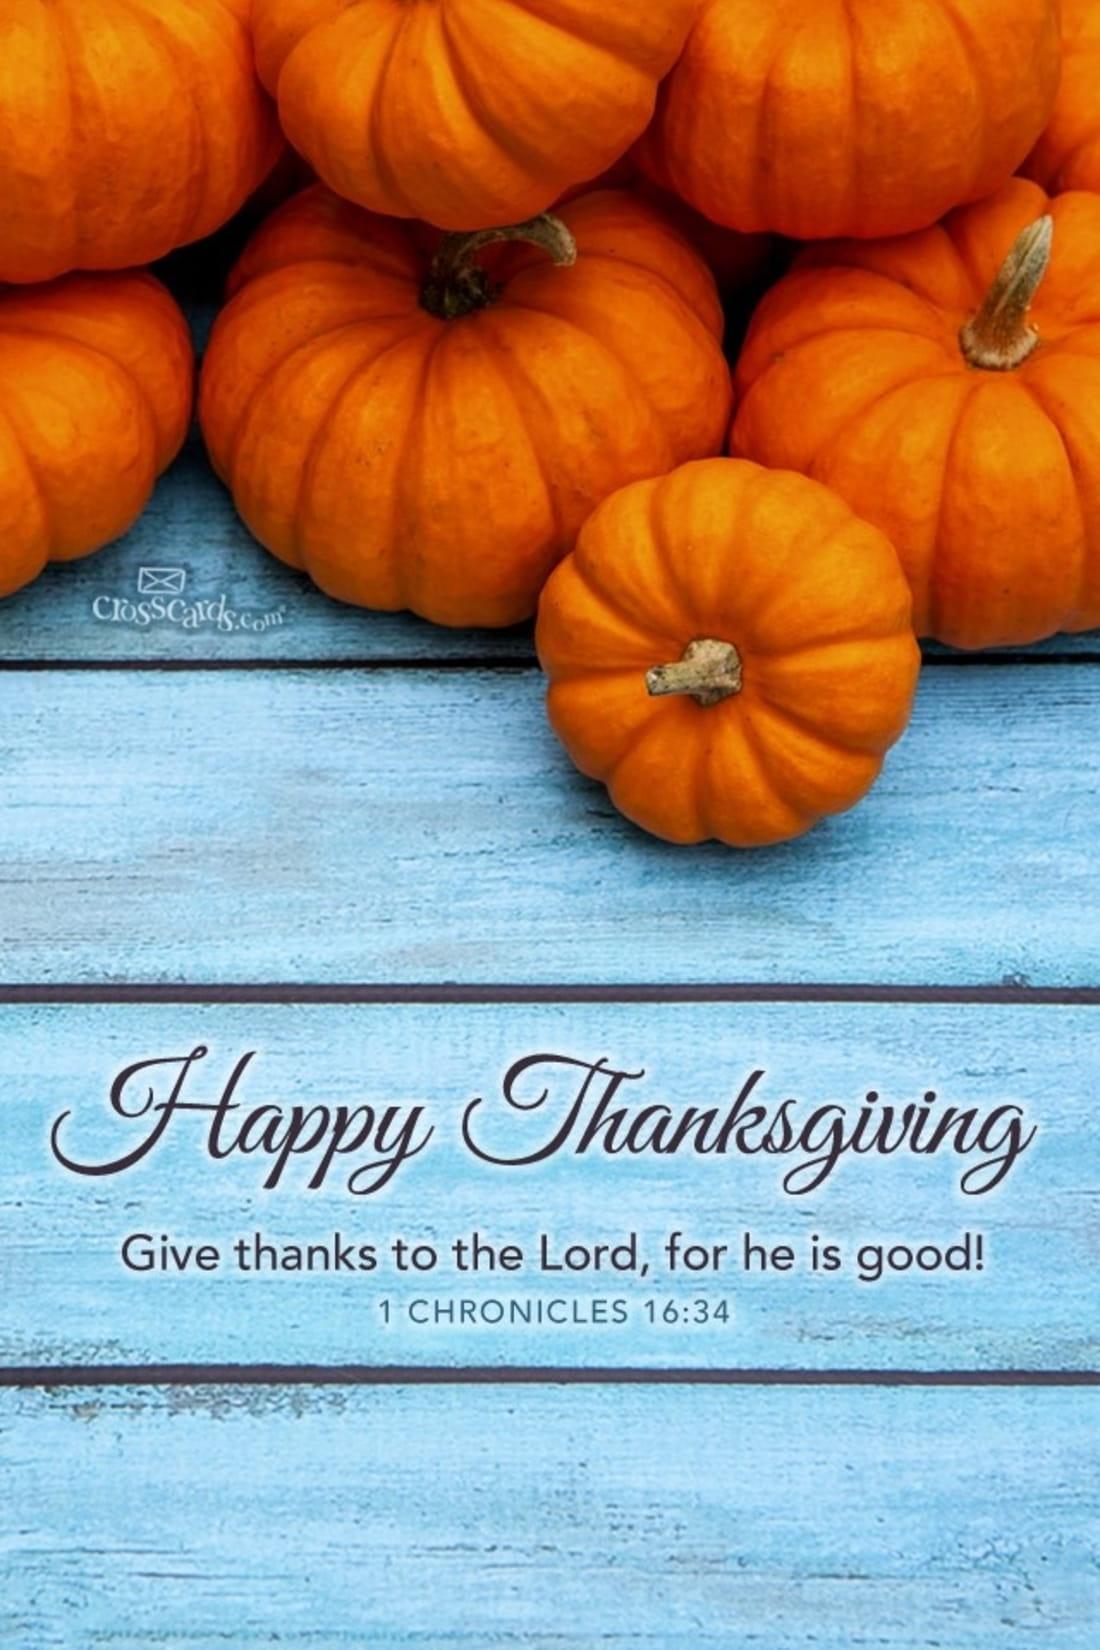 Happy Thanksgiving mobile phone wallpaper